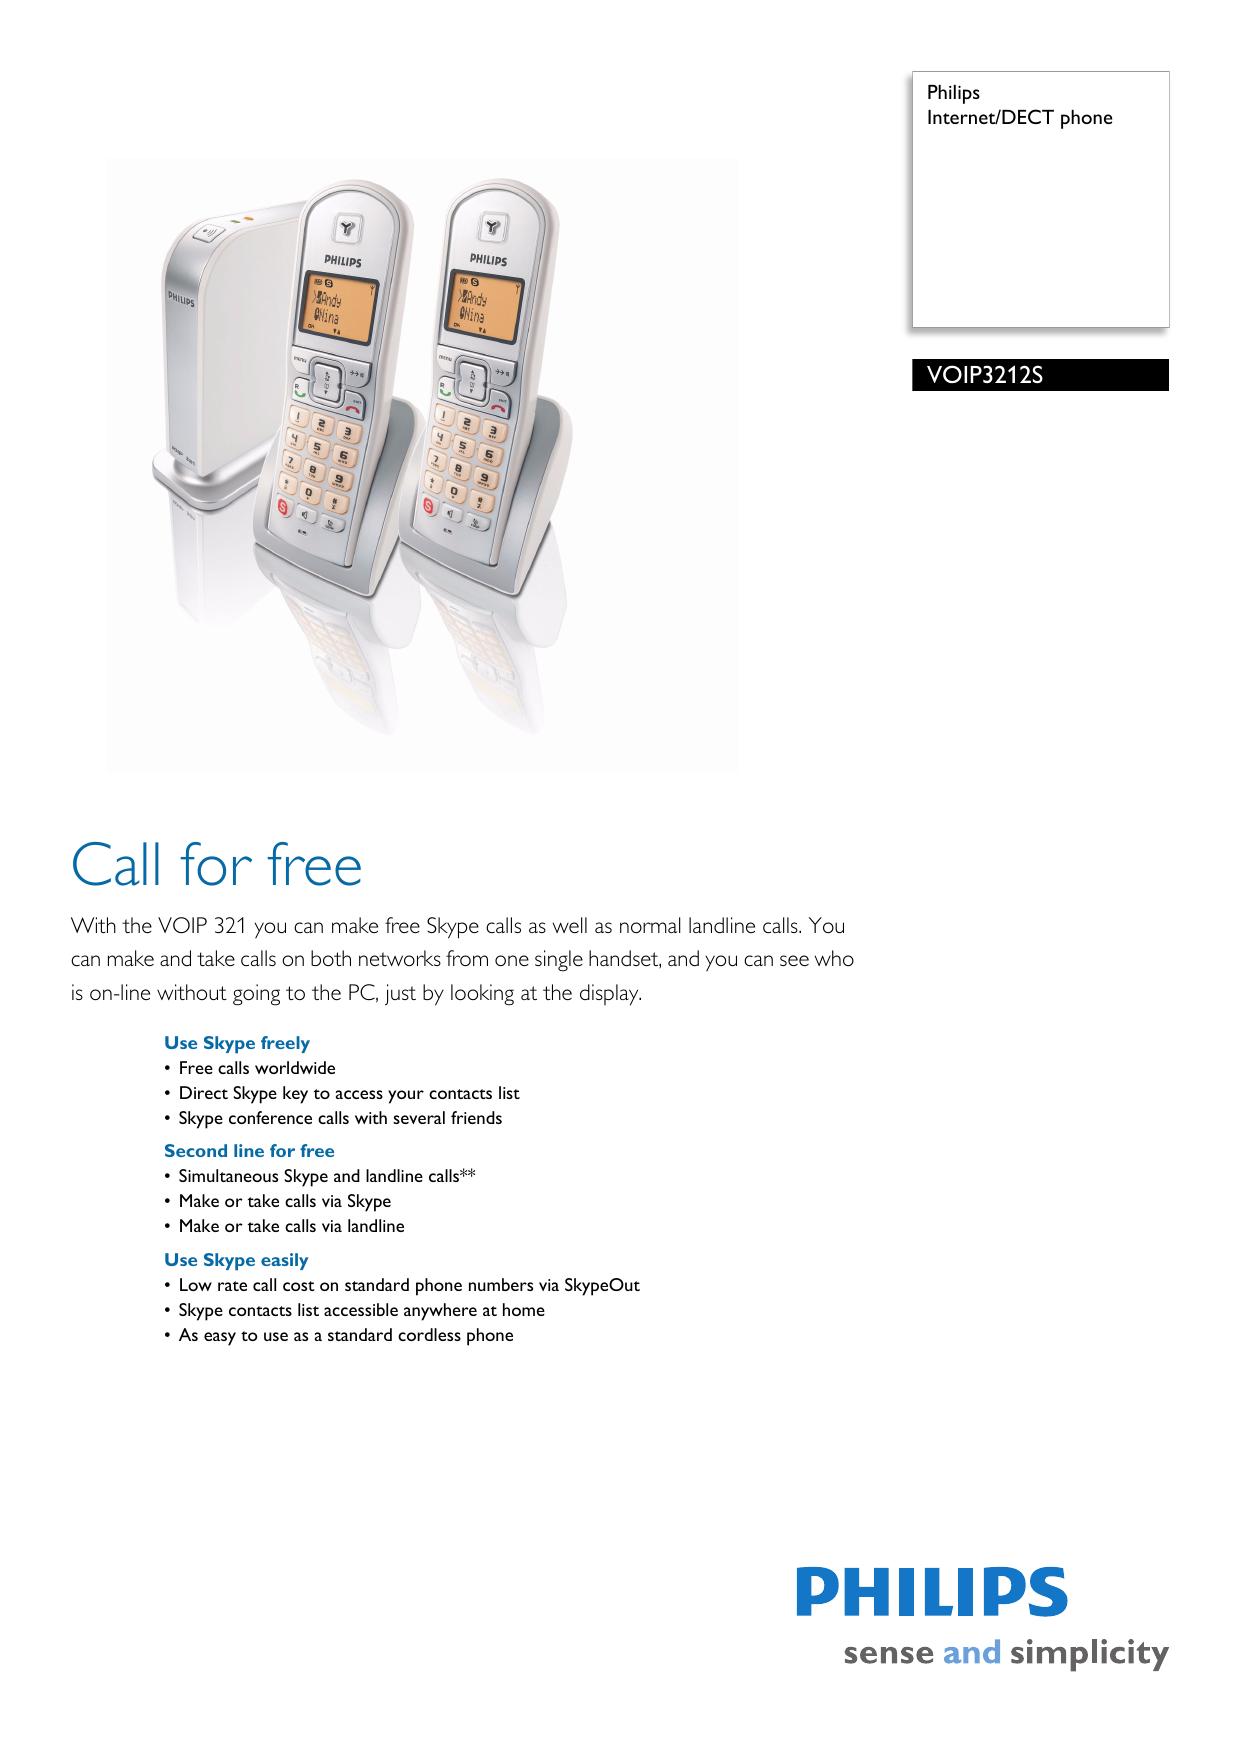 PHILIPS VOIP3212G37 INTERNET PHONE WINDOWS 8 DRIVER